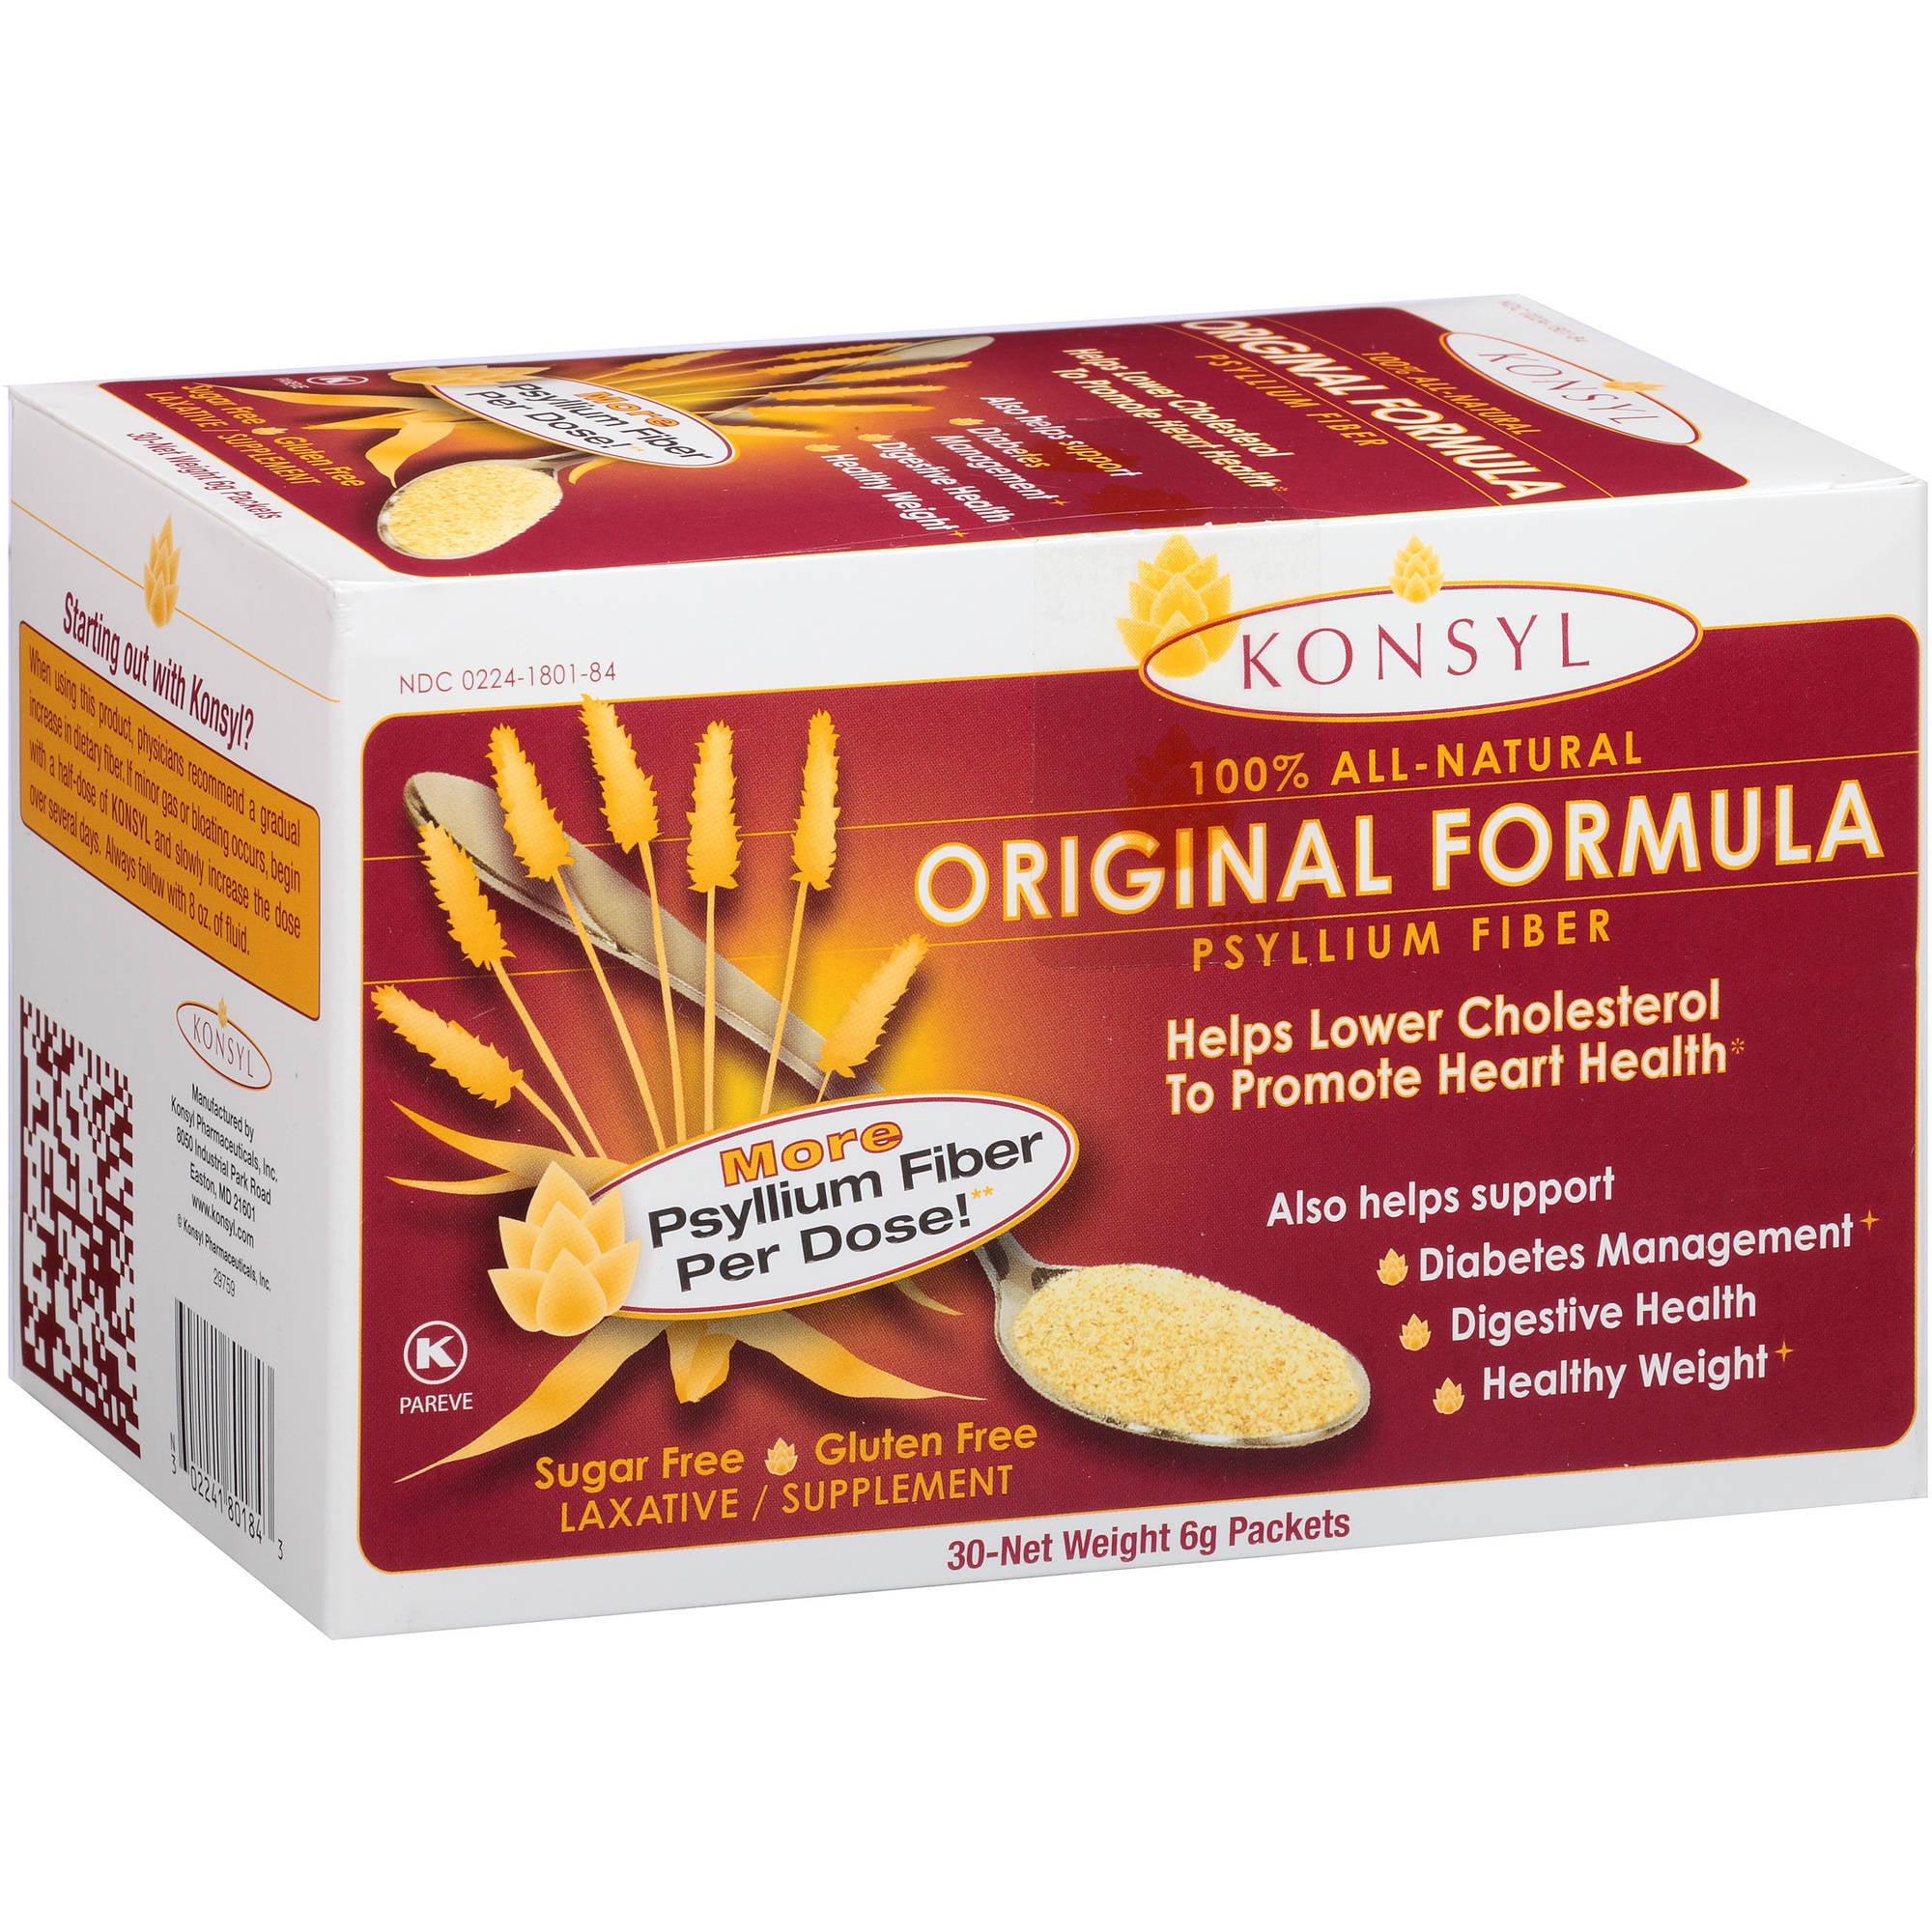 Konsyl Original Formula 100% All-Natural Psyllium Fiber Laxative/Supplement Powder Packets, 6g, 30 count